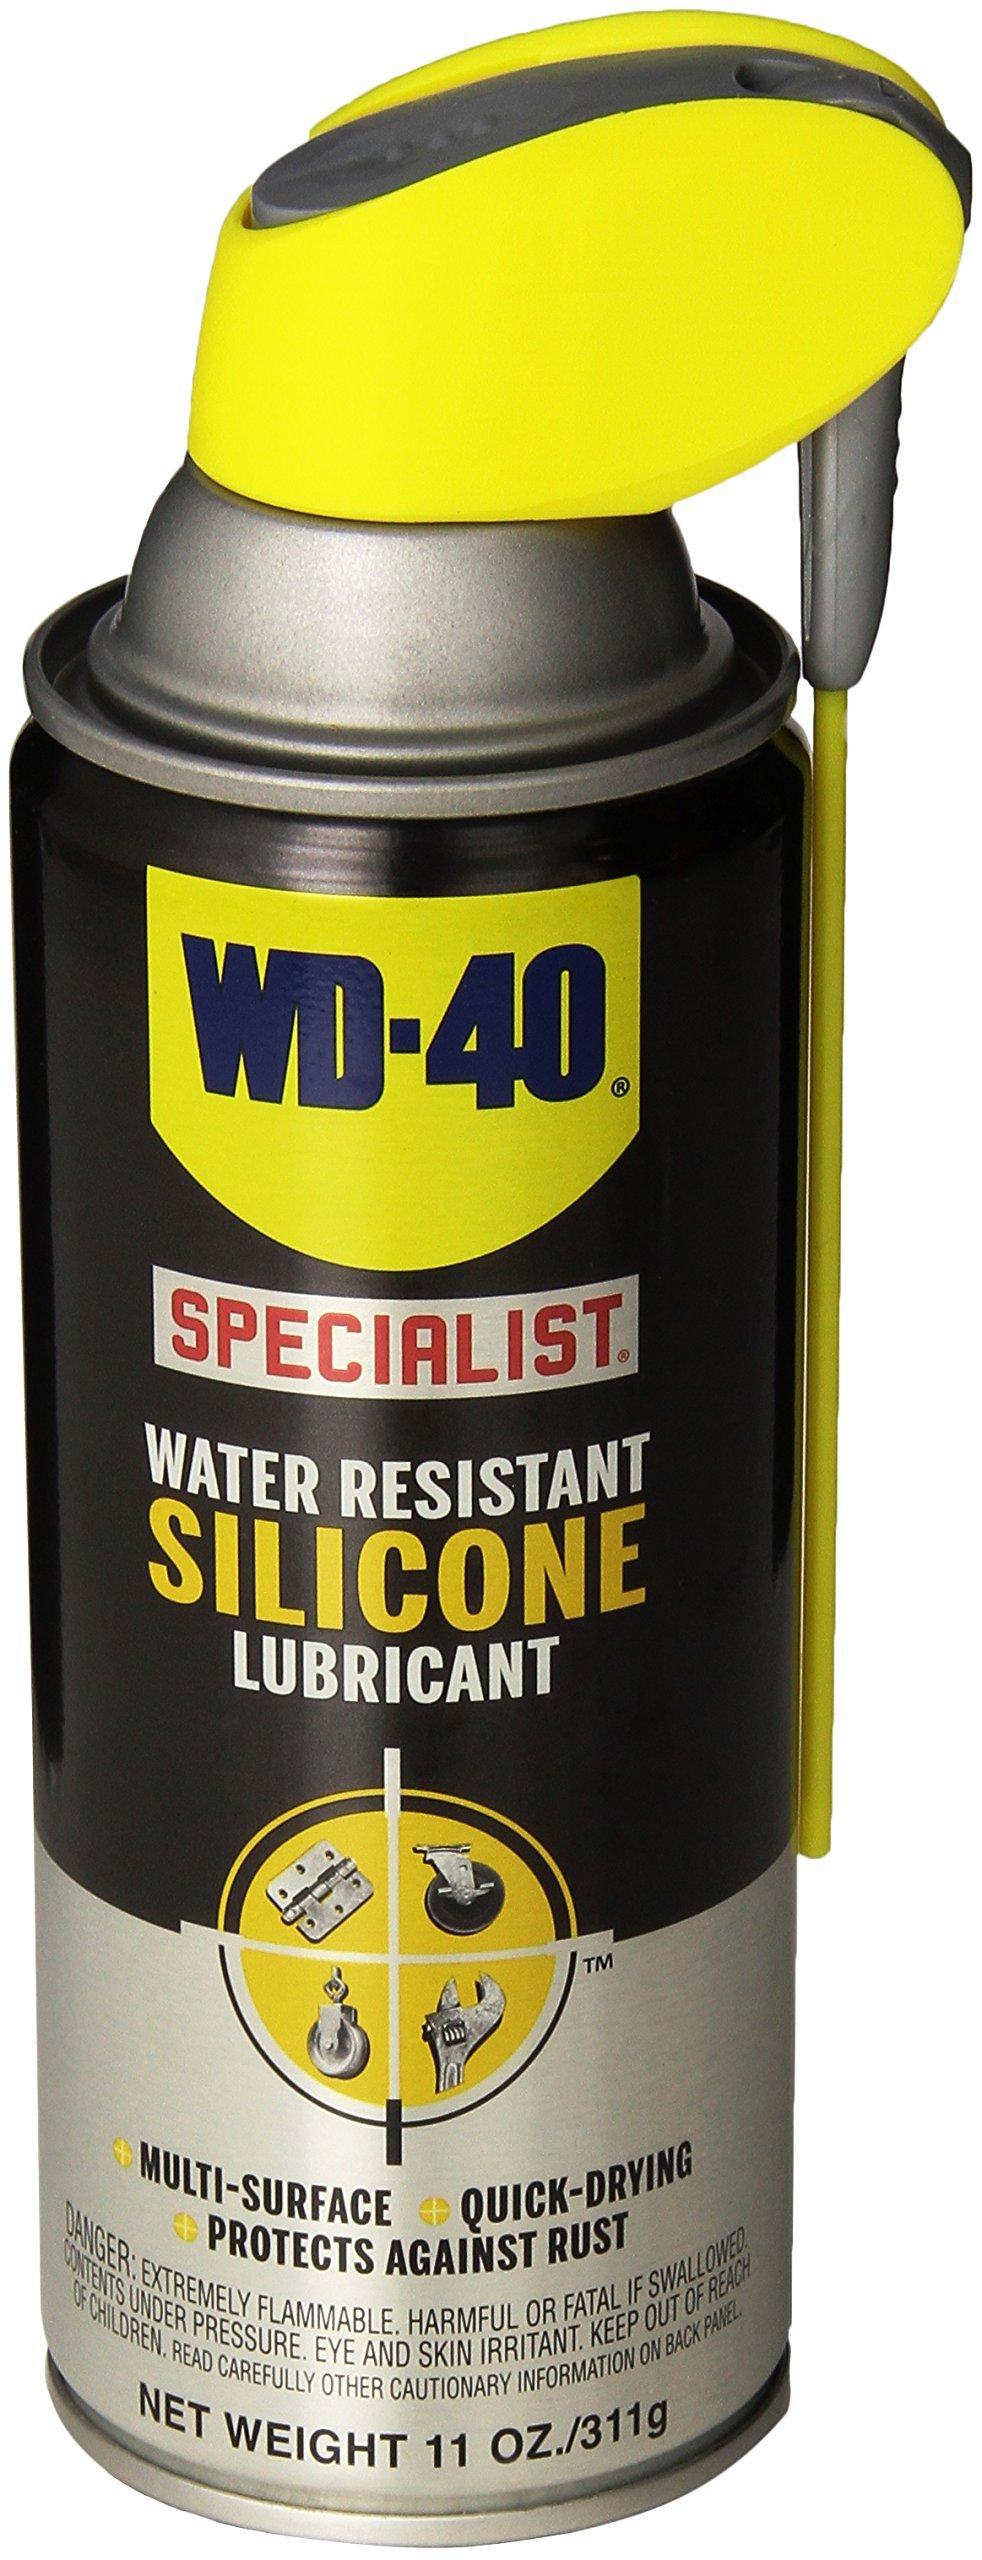 WD-40 Specialist Water Resistant Silicone Lubricant with SMART STRAWSPRAYS 2 WAYS 11 OZ [6-Pack] by WD-40